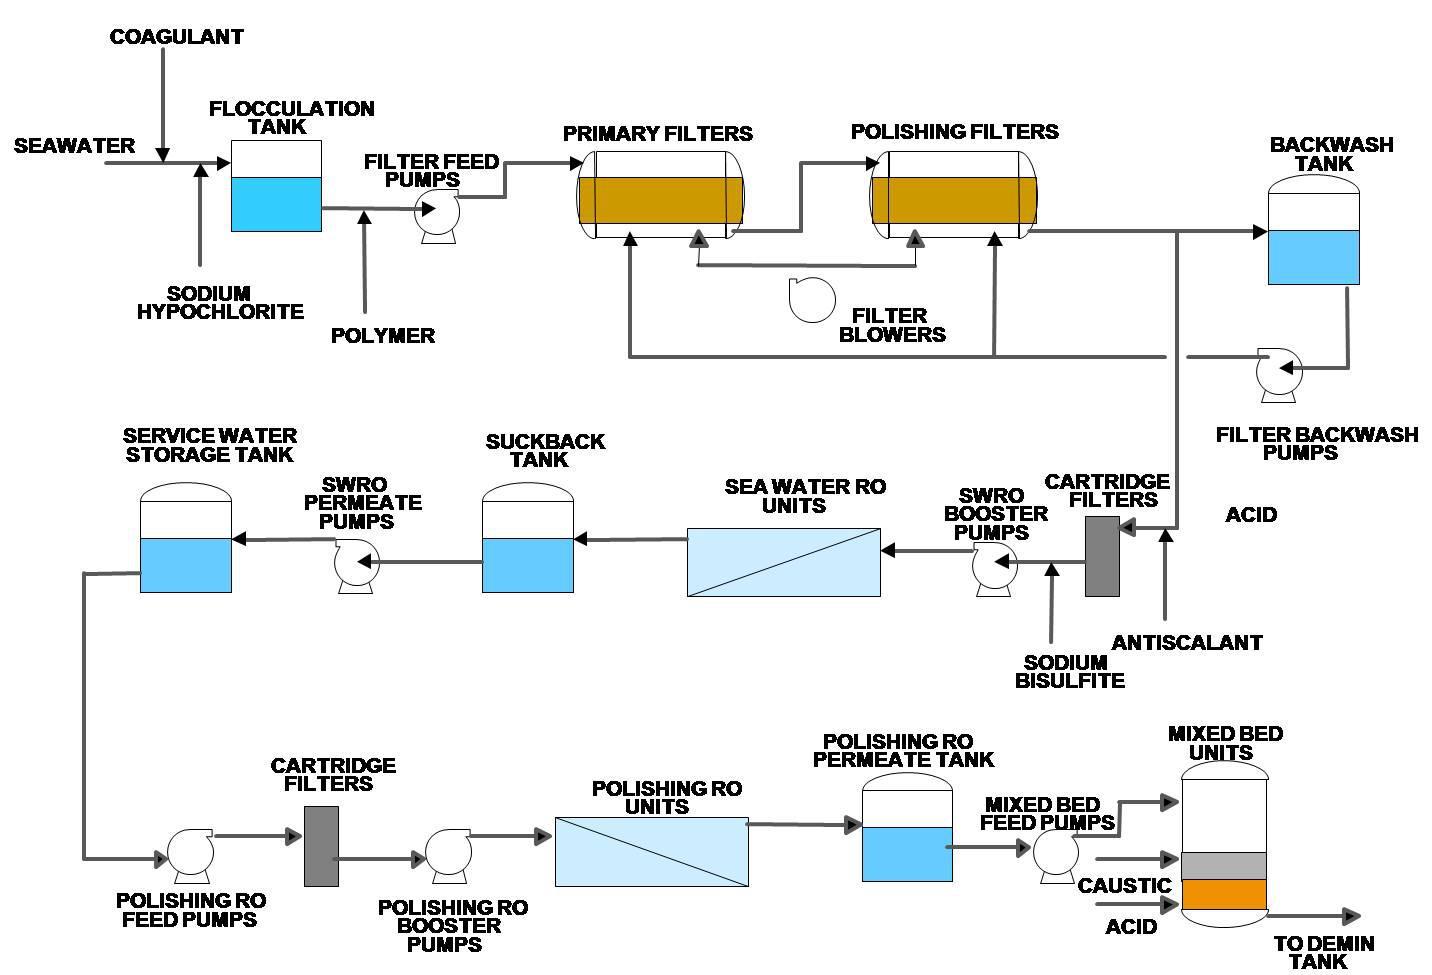 Desalination process flow chart choice image free any chart examples desalination process flow chart images free any chart examples desalination process flow chart image collections free nvjuhfo Images